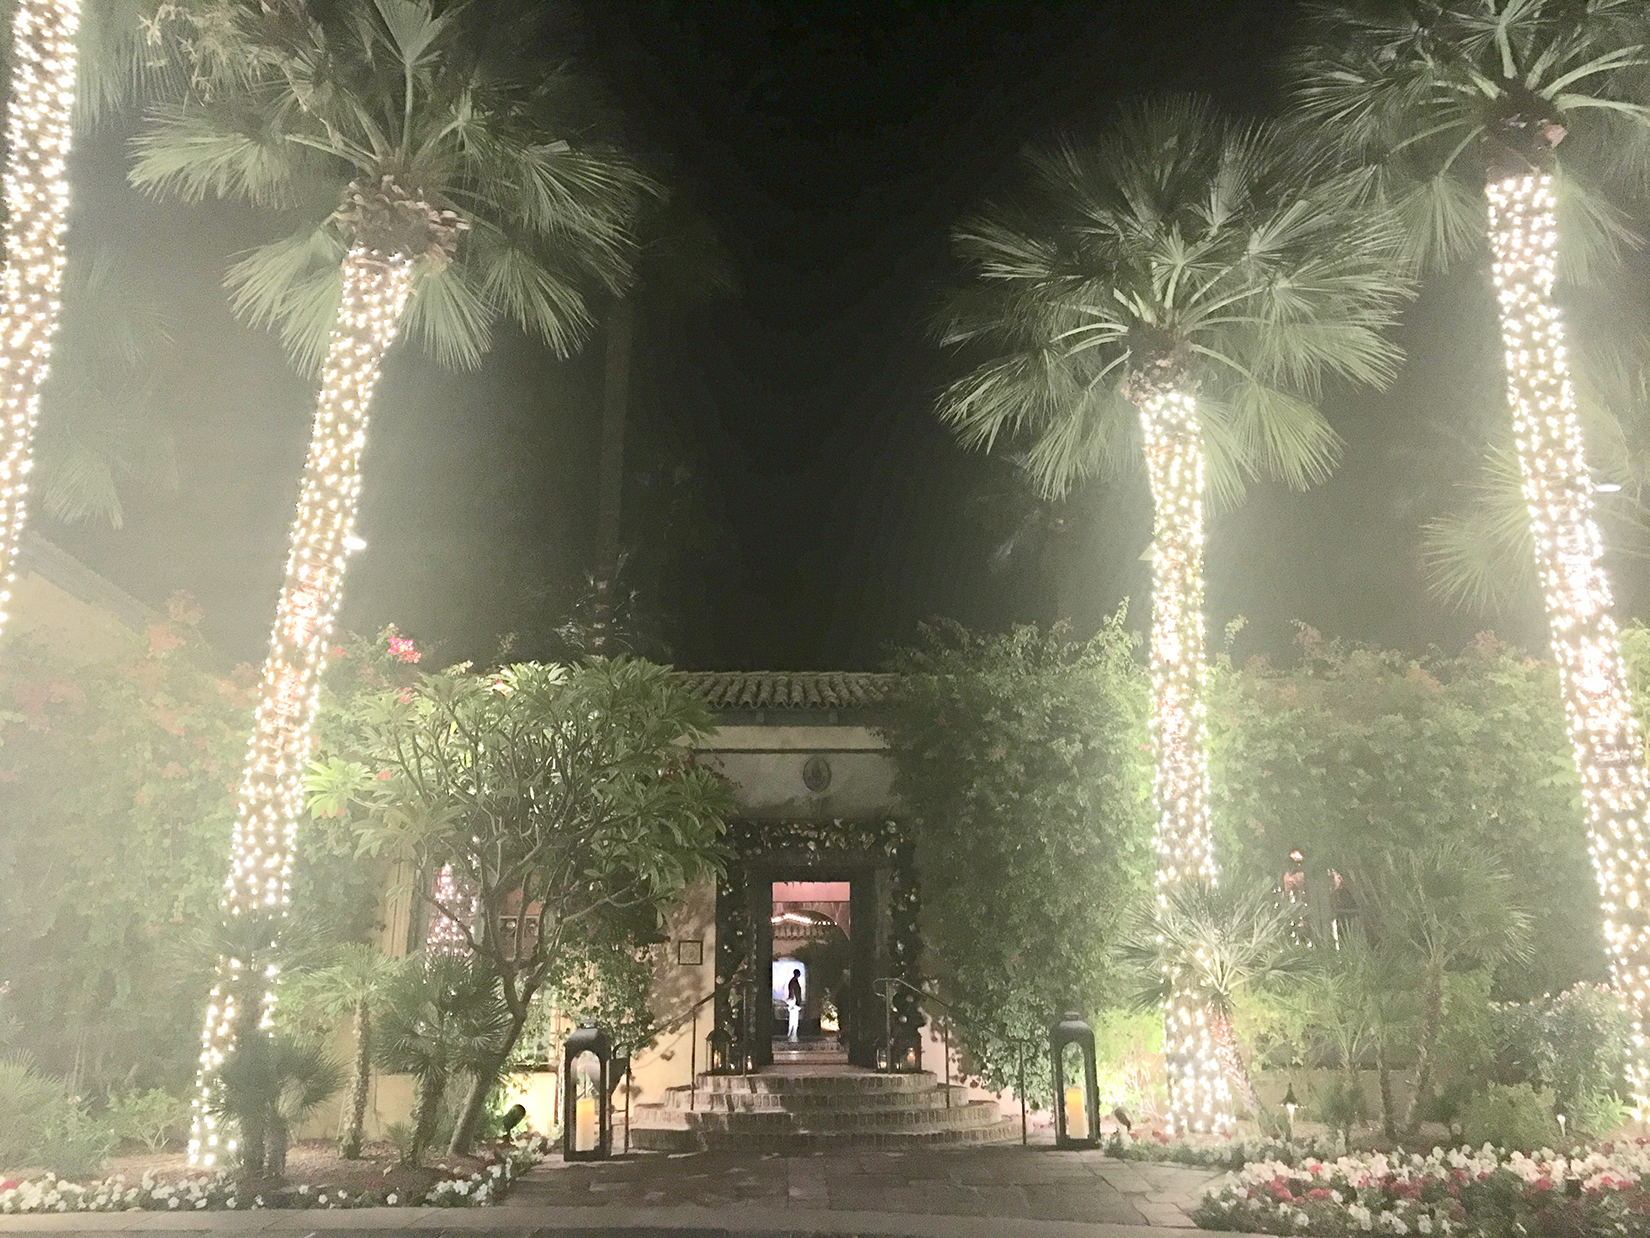 royal palms resort & spa.png